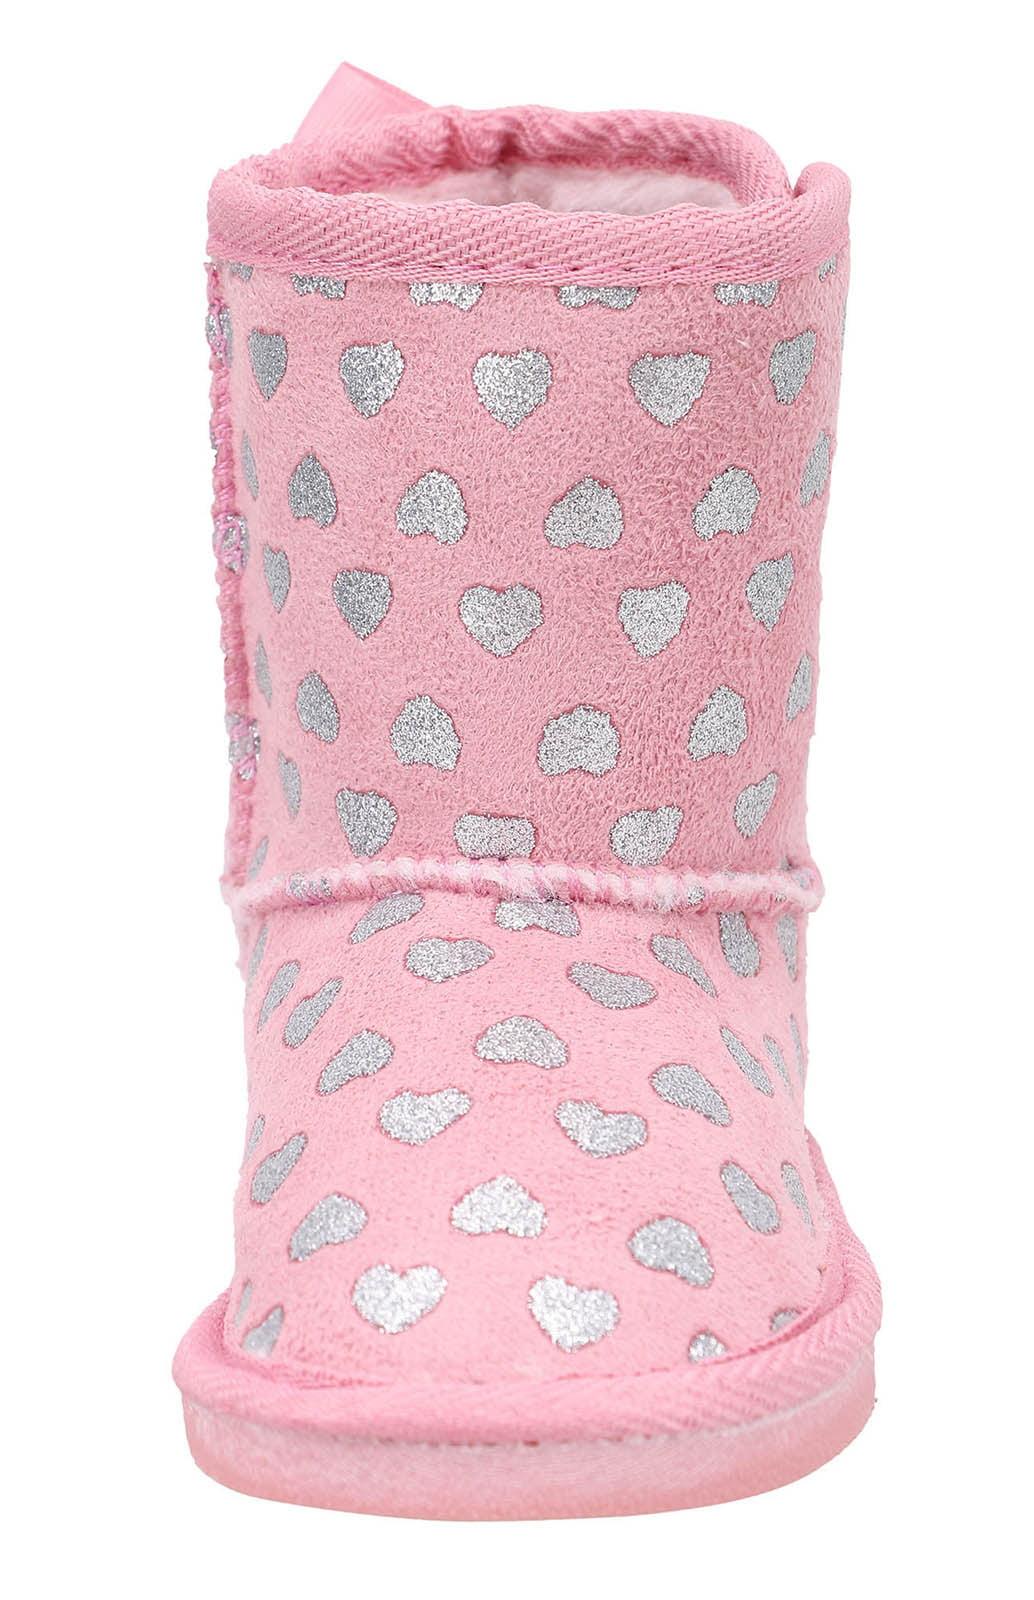 Kids Girls Winter Boots Faux Fur Lined